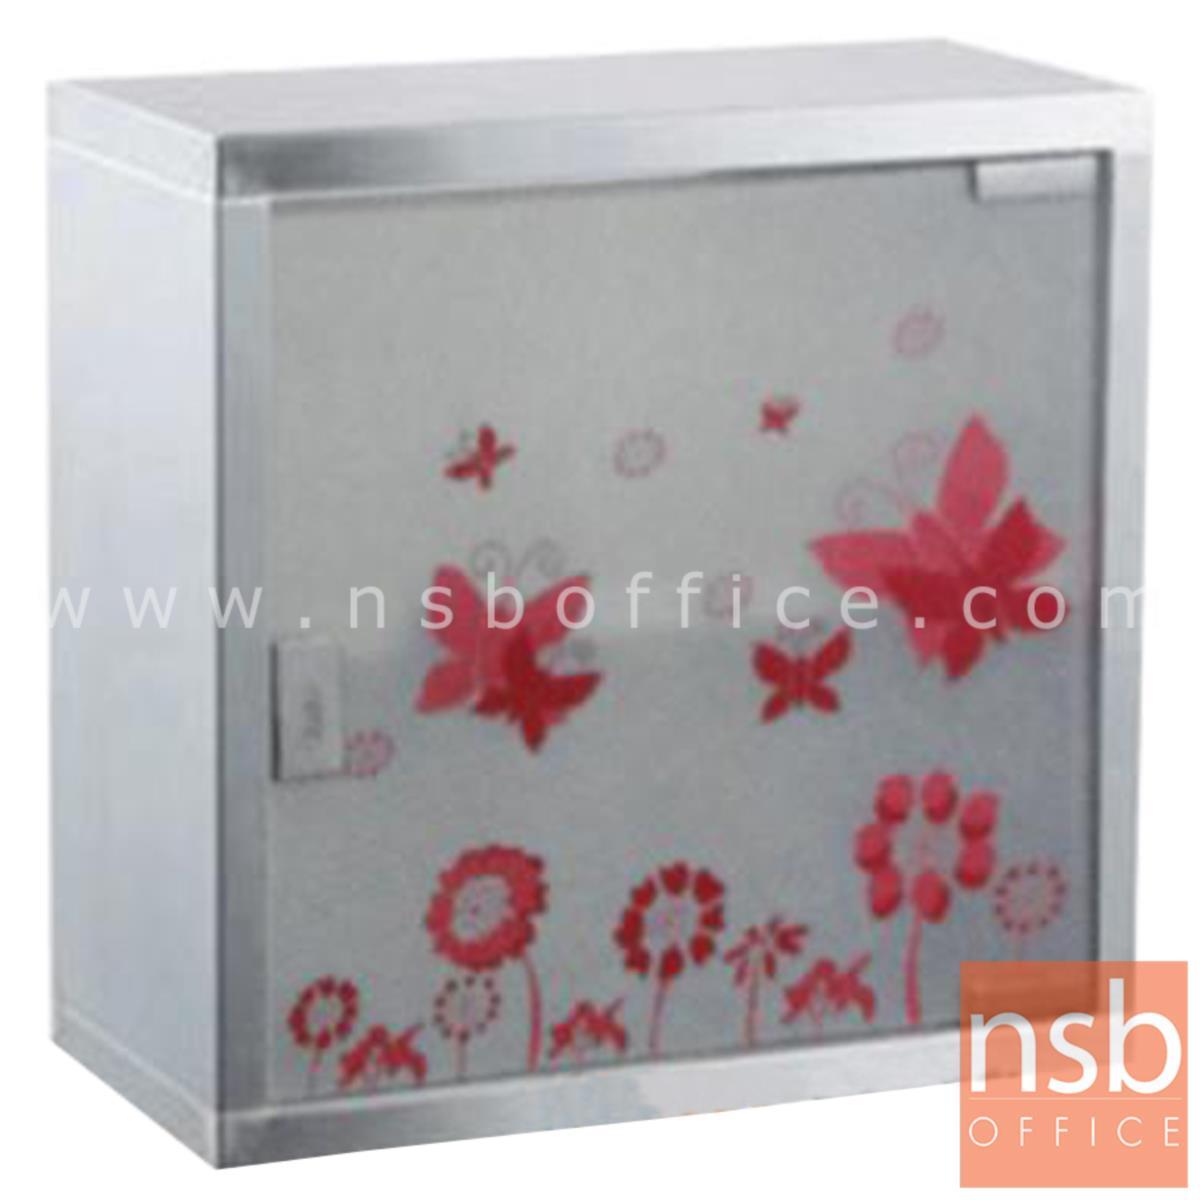 G15A012:ตู้ยาสามัญประจำบ้านหน้าบานกระจก มีลวดลาย รุ่น SAVE-3